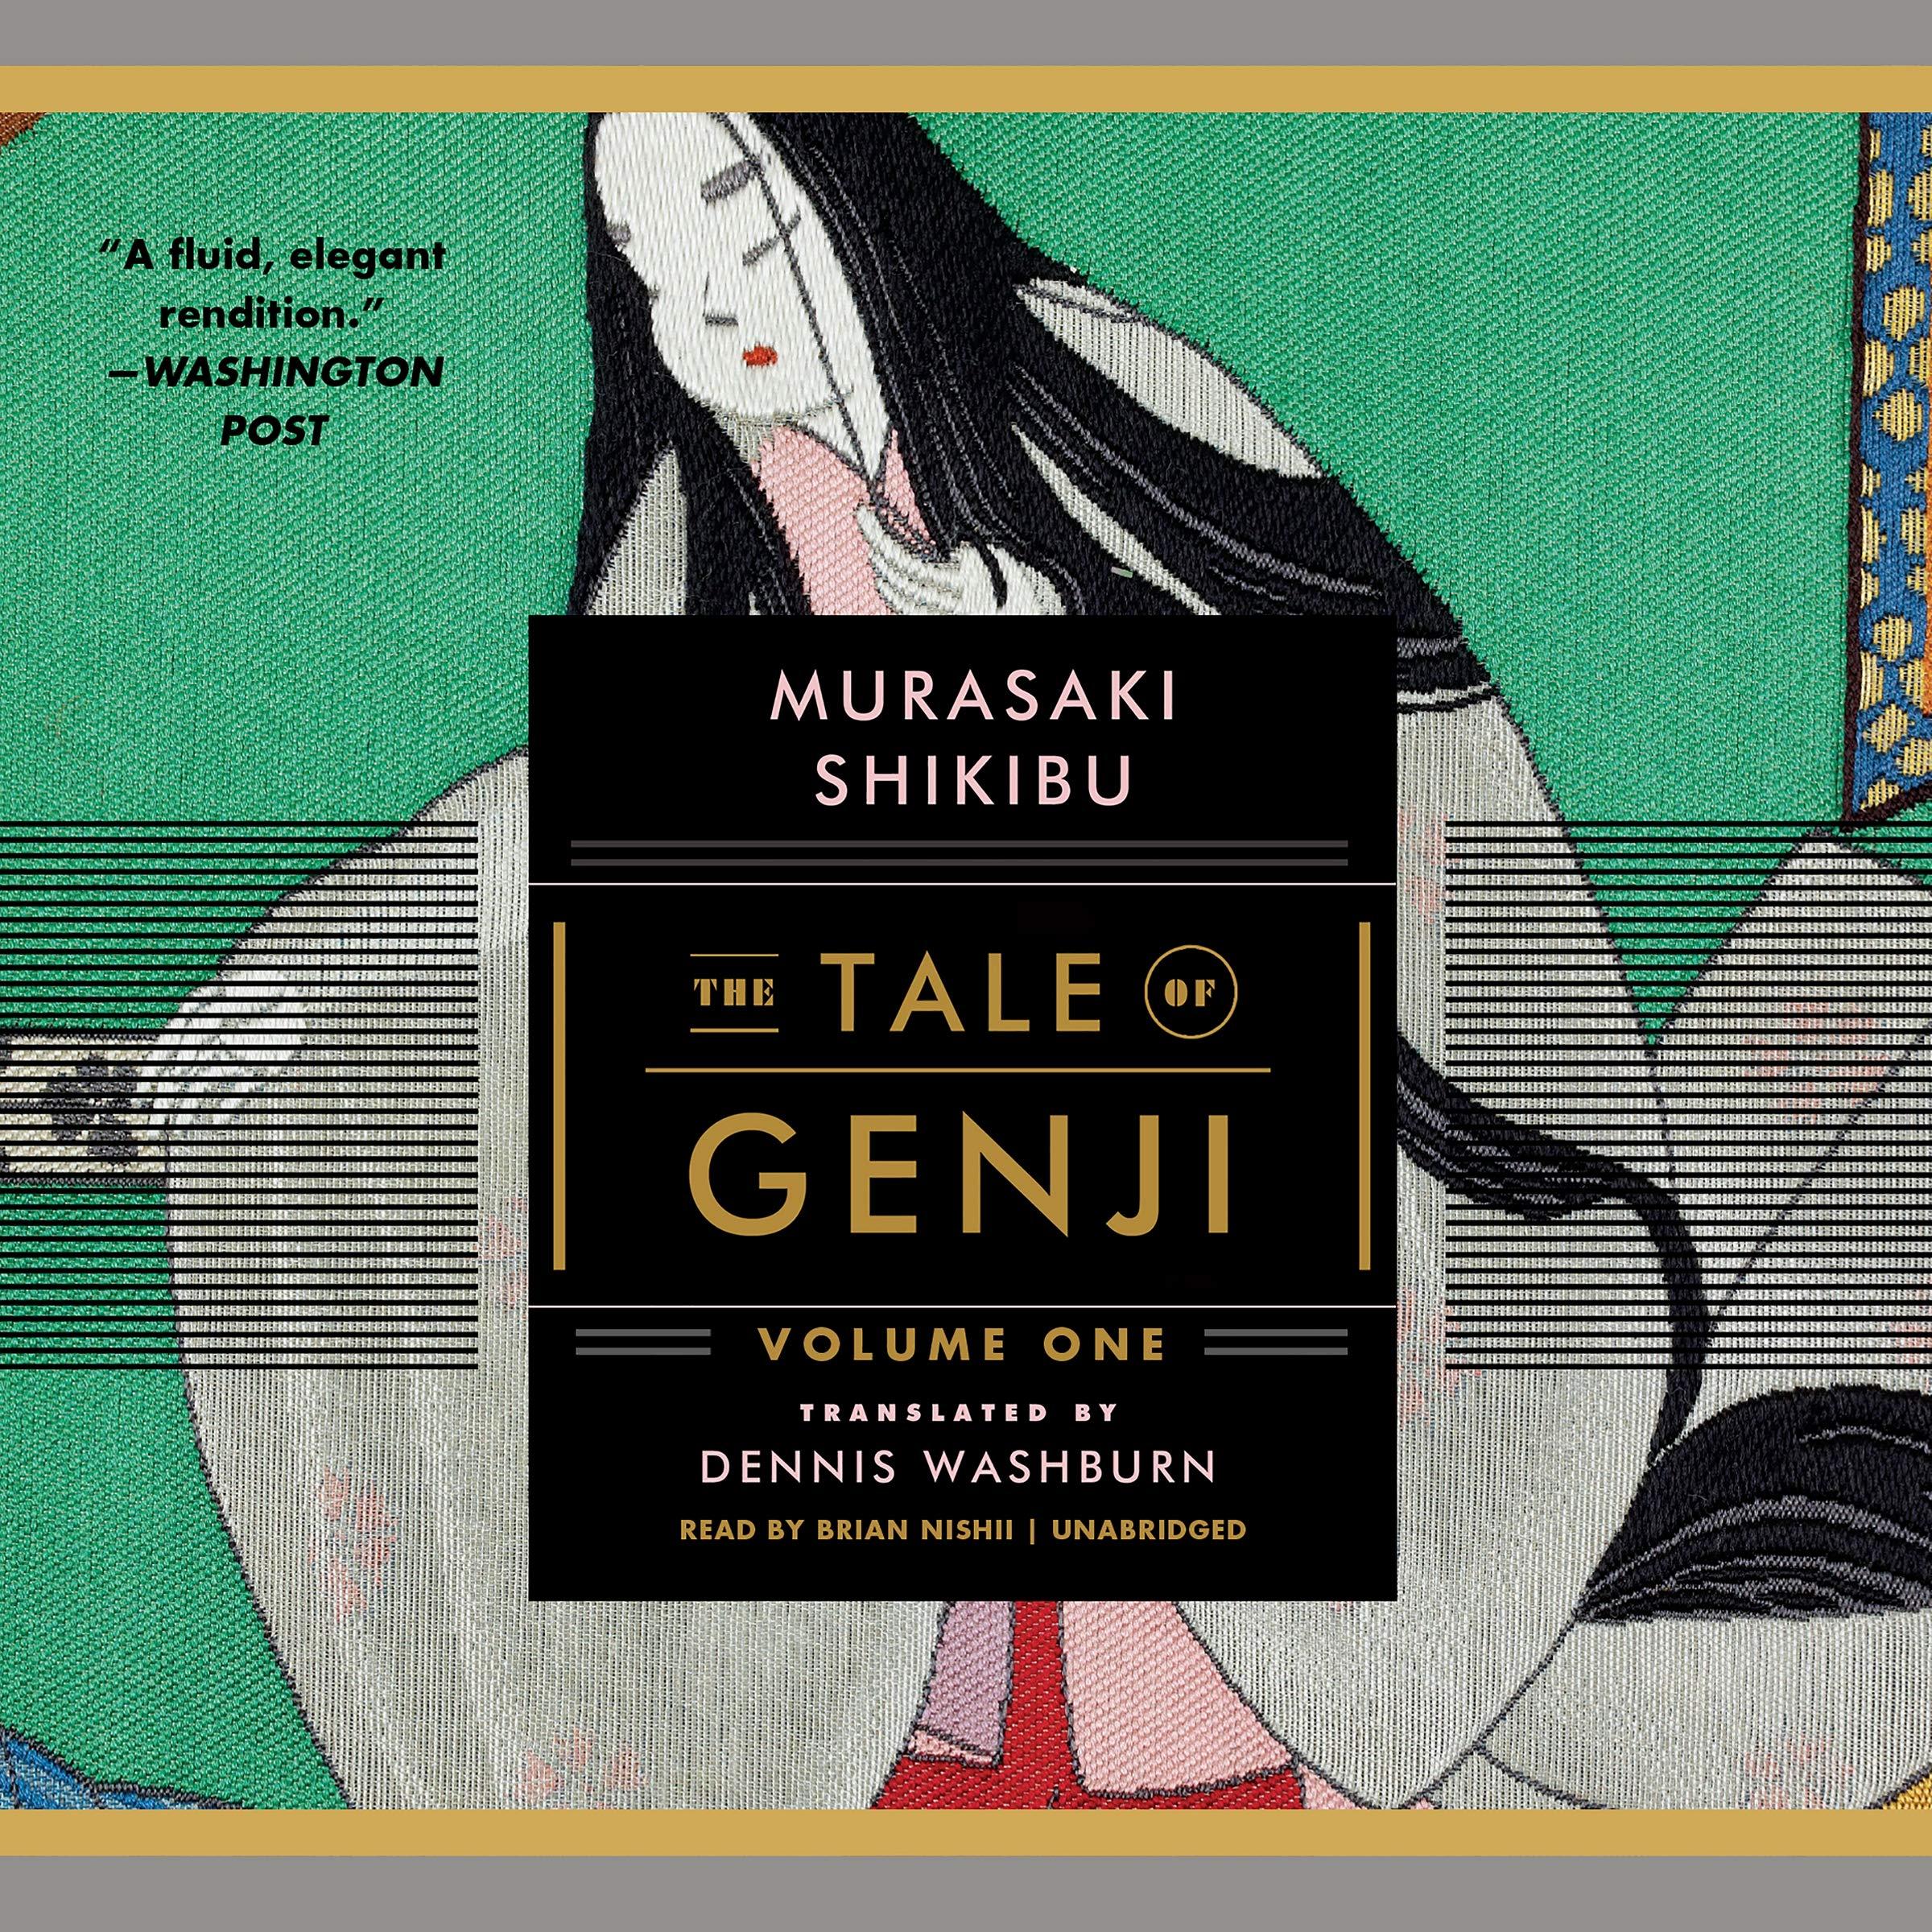 Murasaki Shikibu - The Tale of Genji (trans. by Dennis Washburn)